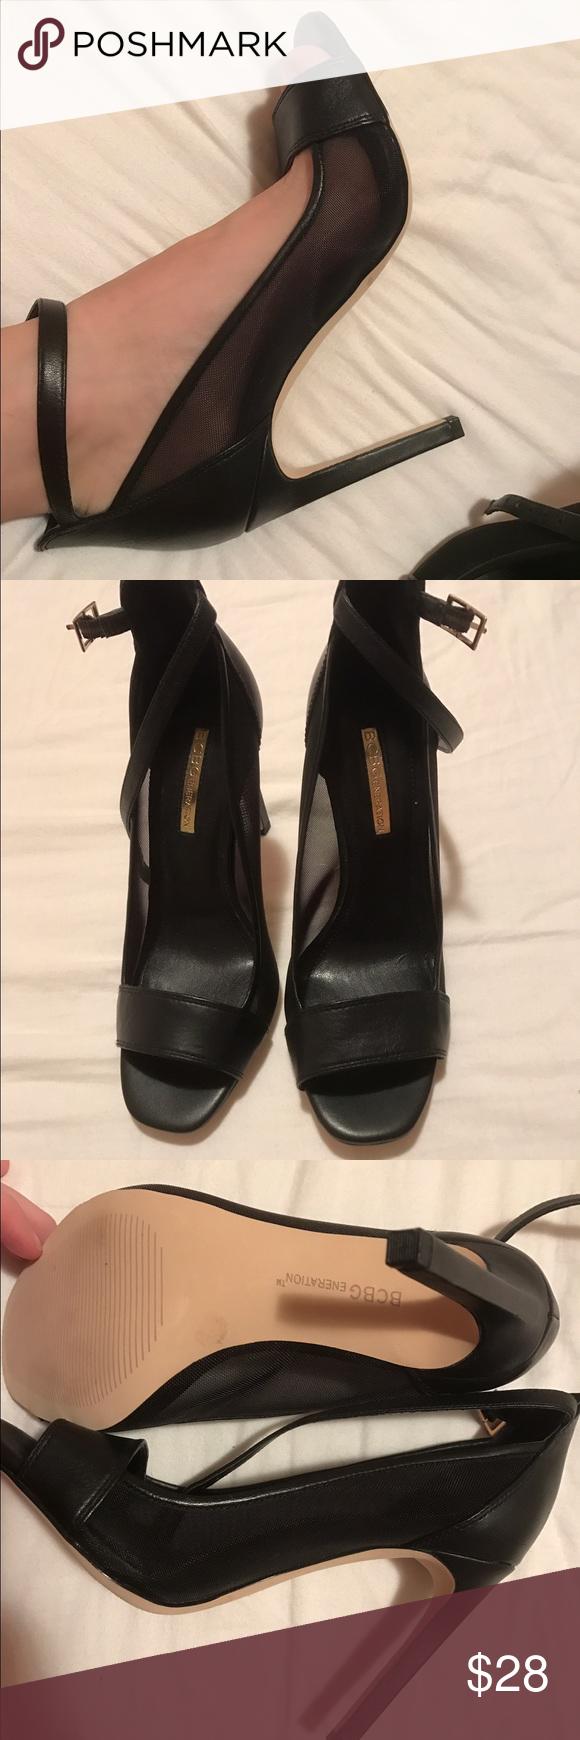 Never worn BCBG mesh open toe heels Mesh side, tall heel, open toe BCBGeneration Shoes Heels